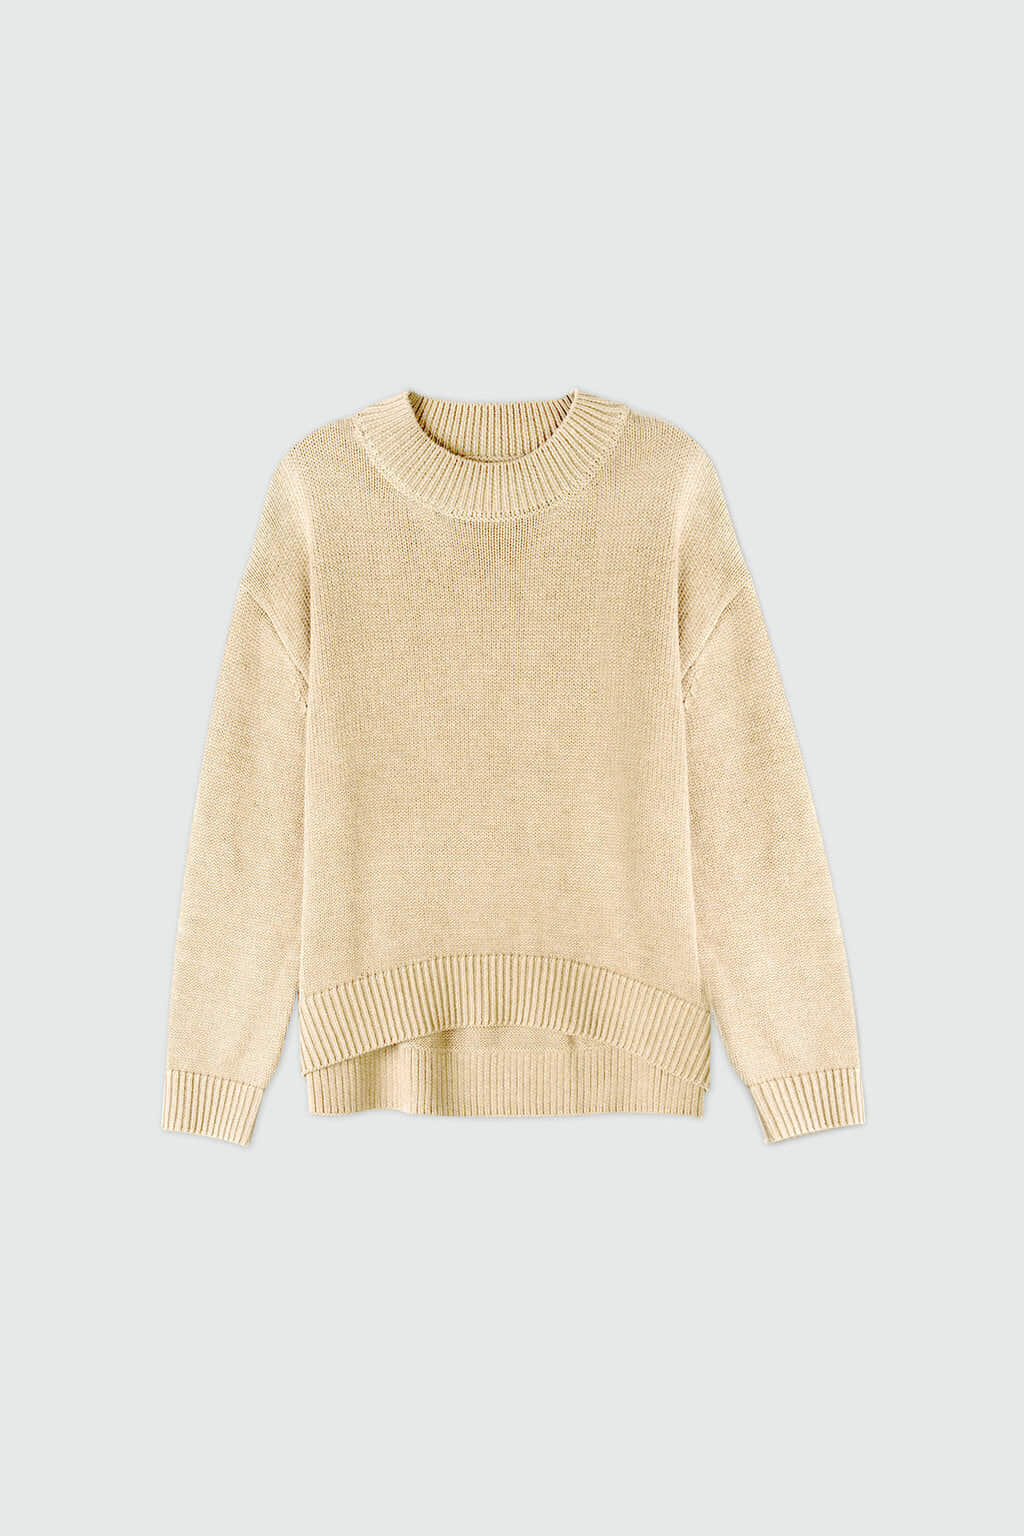 Sweater 3322 Cream 5